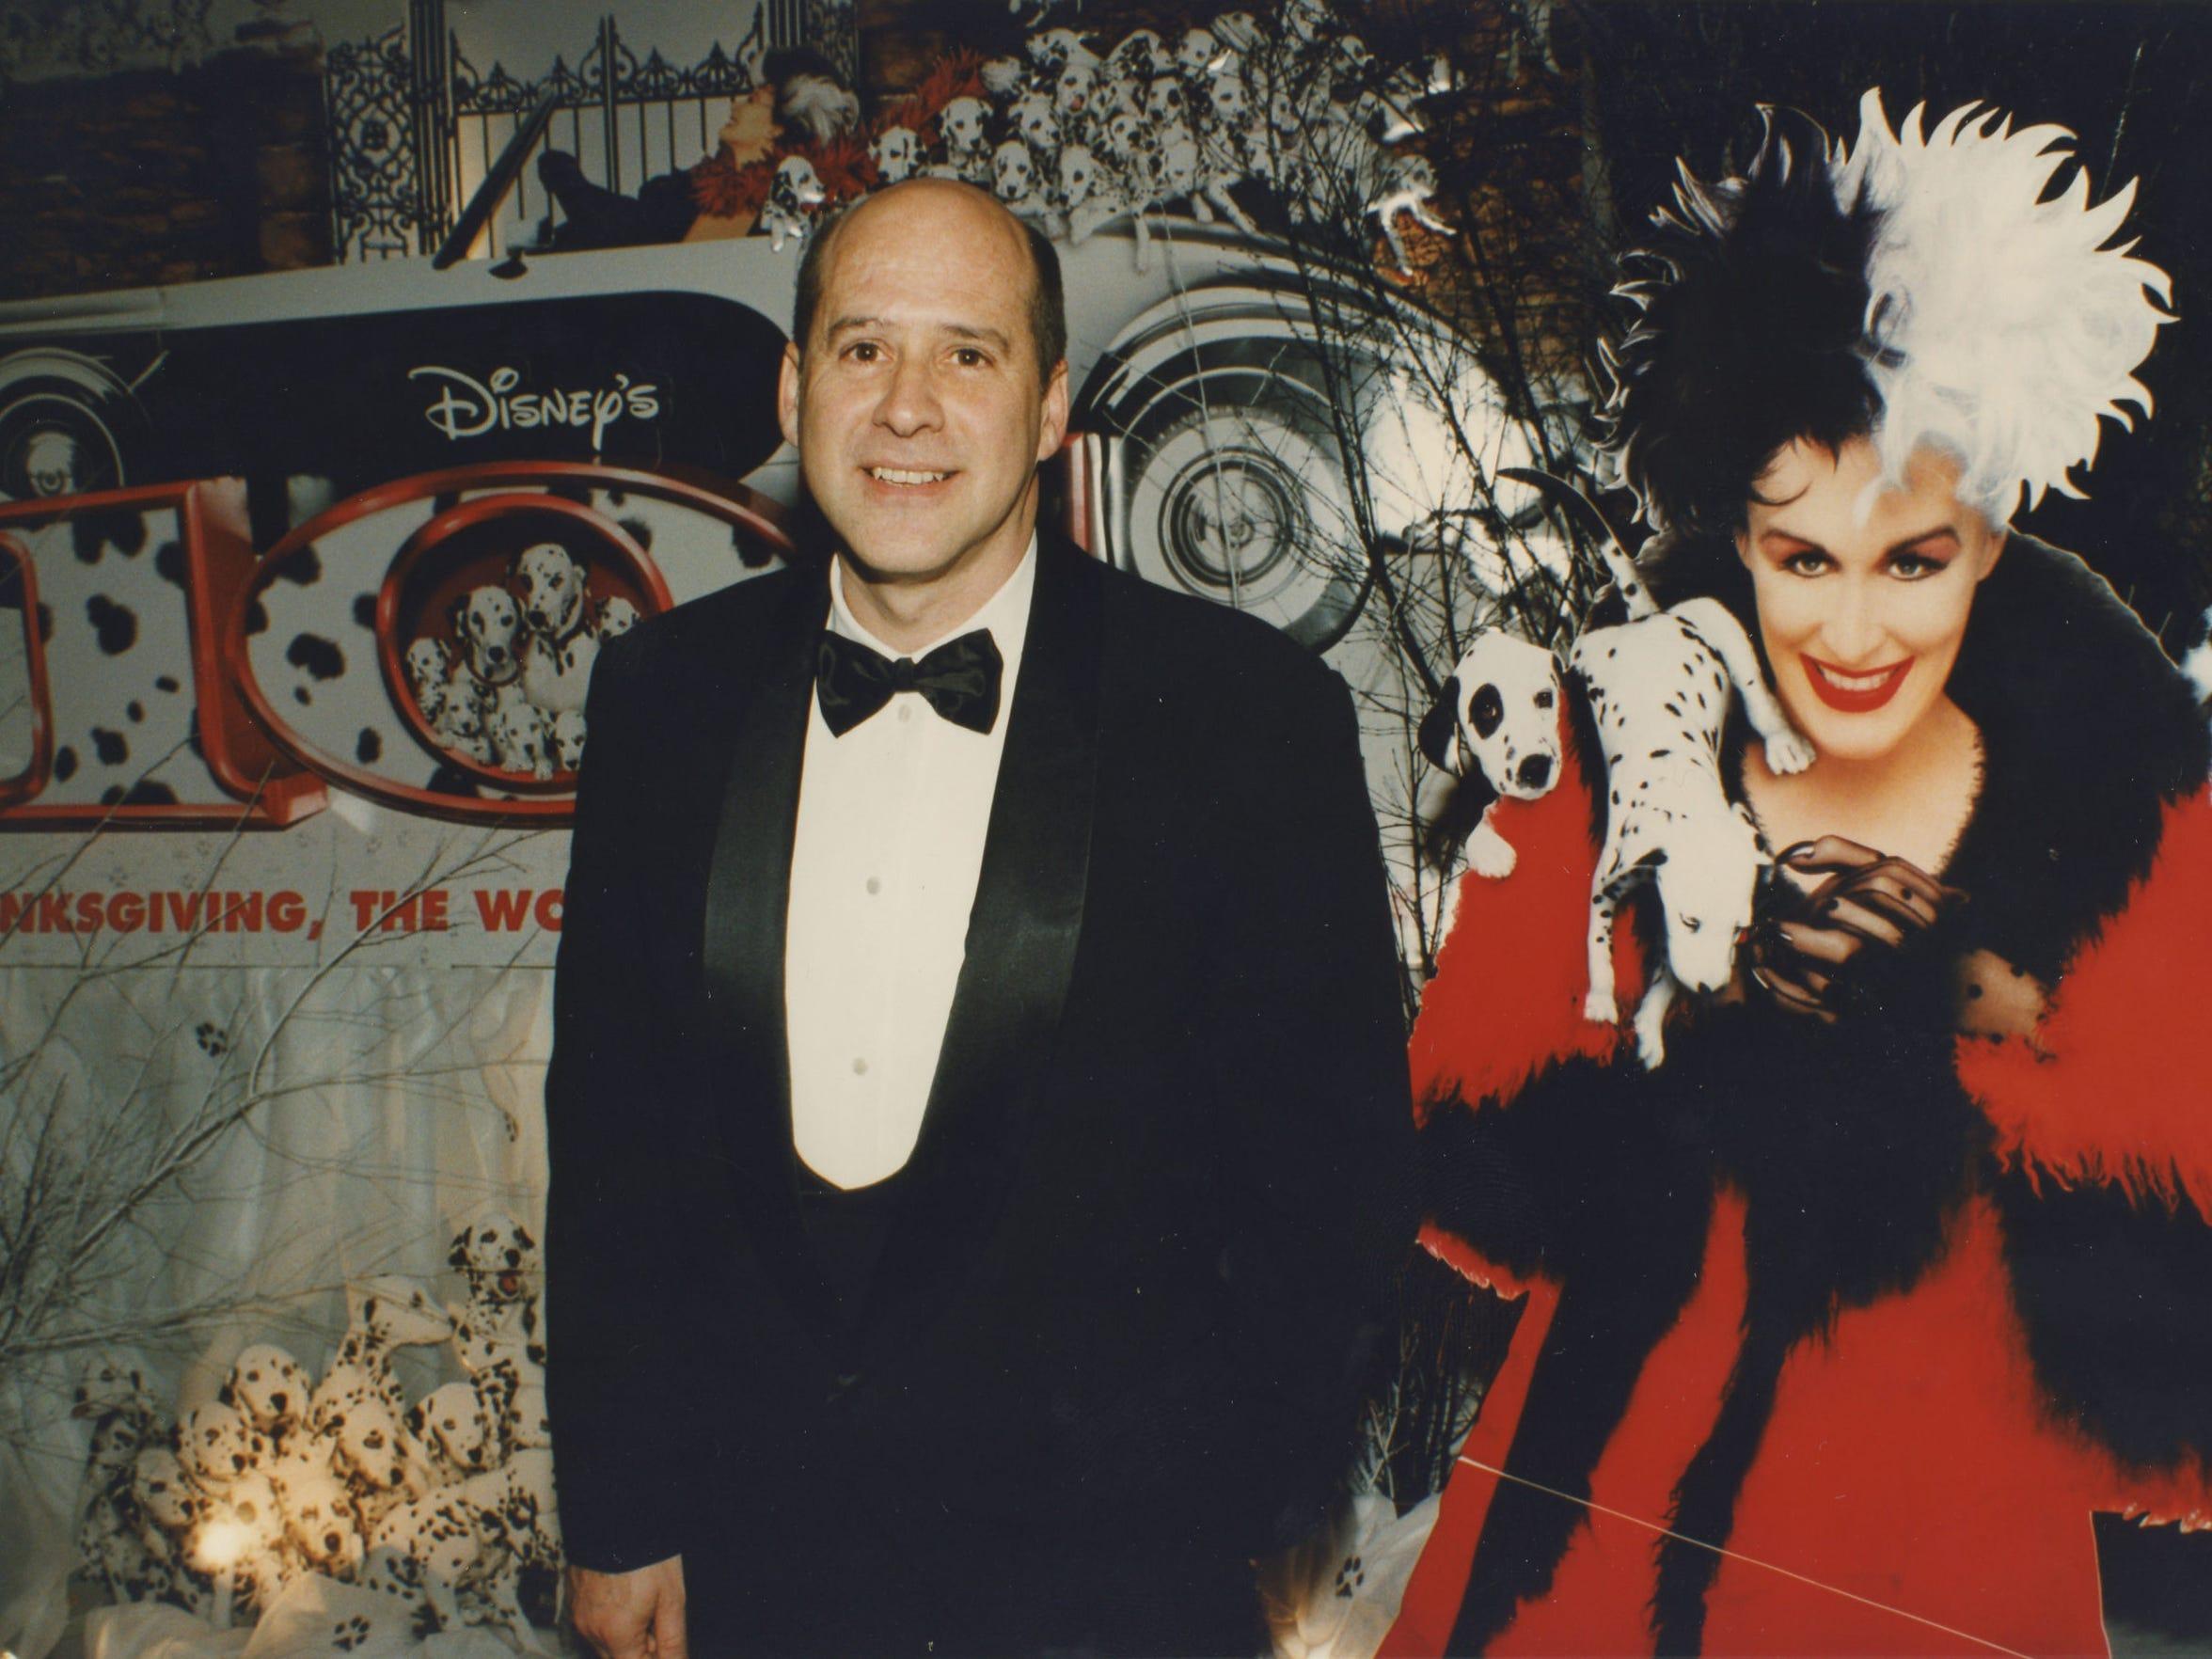 David Vogel during the premiere of Disney's 101 Dalmatians.